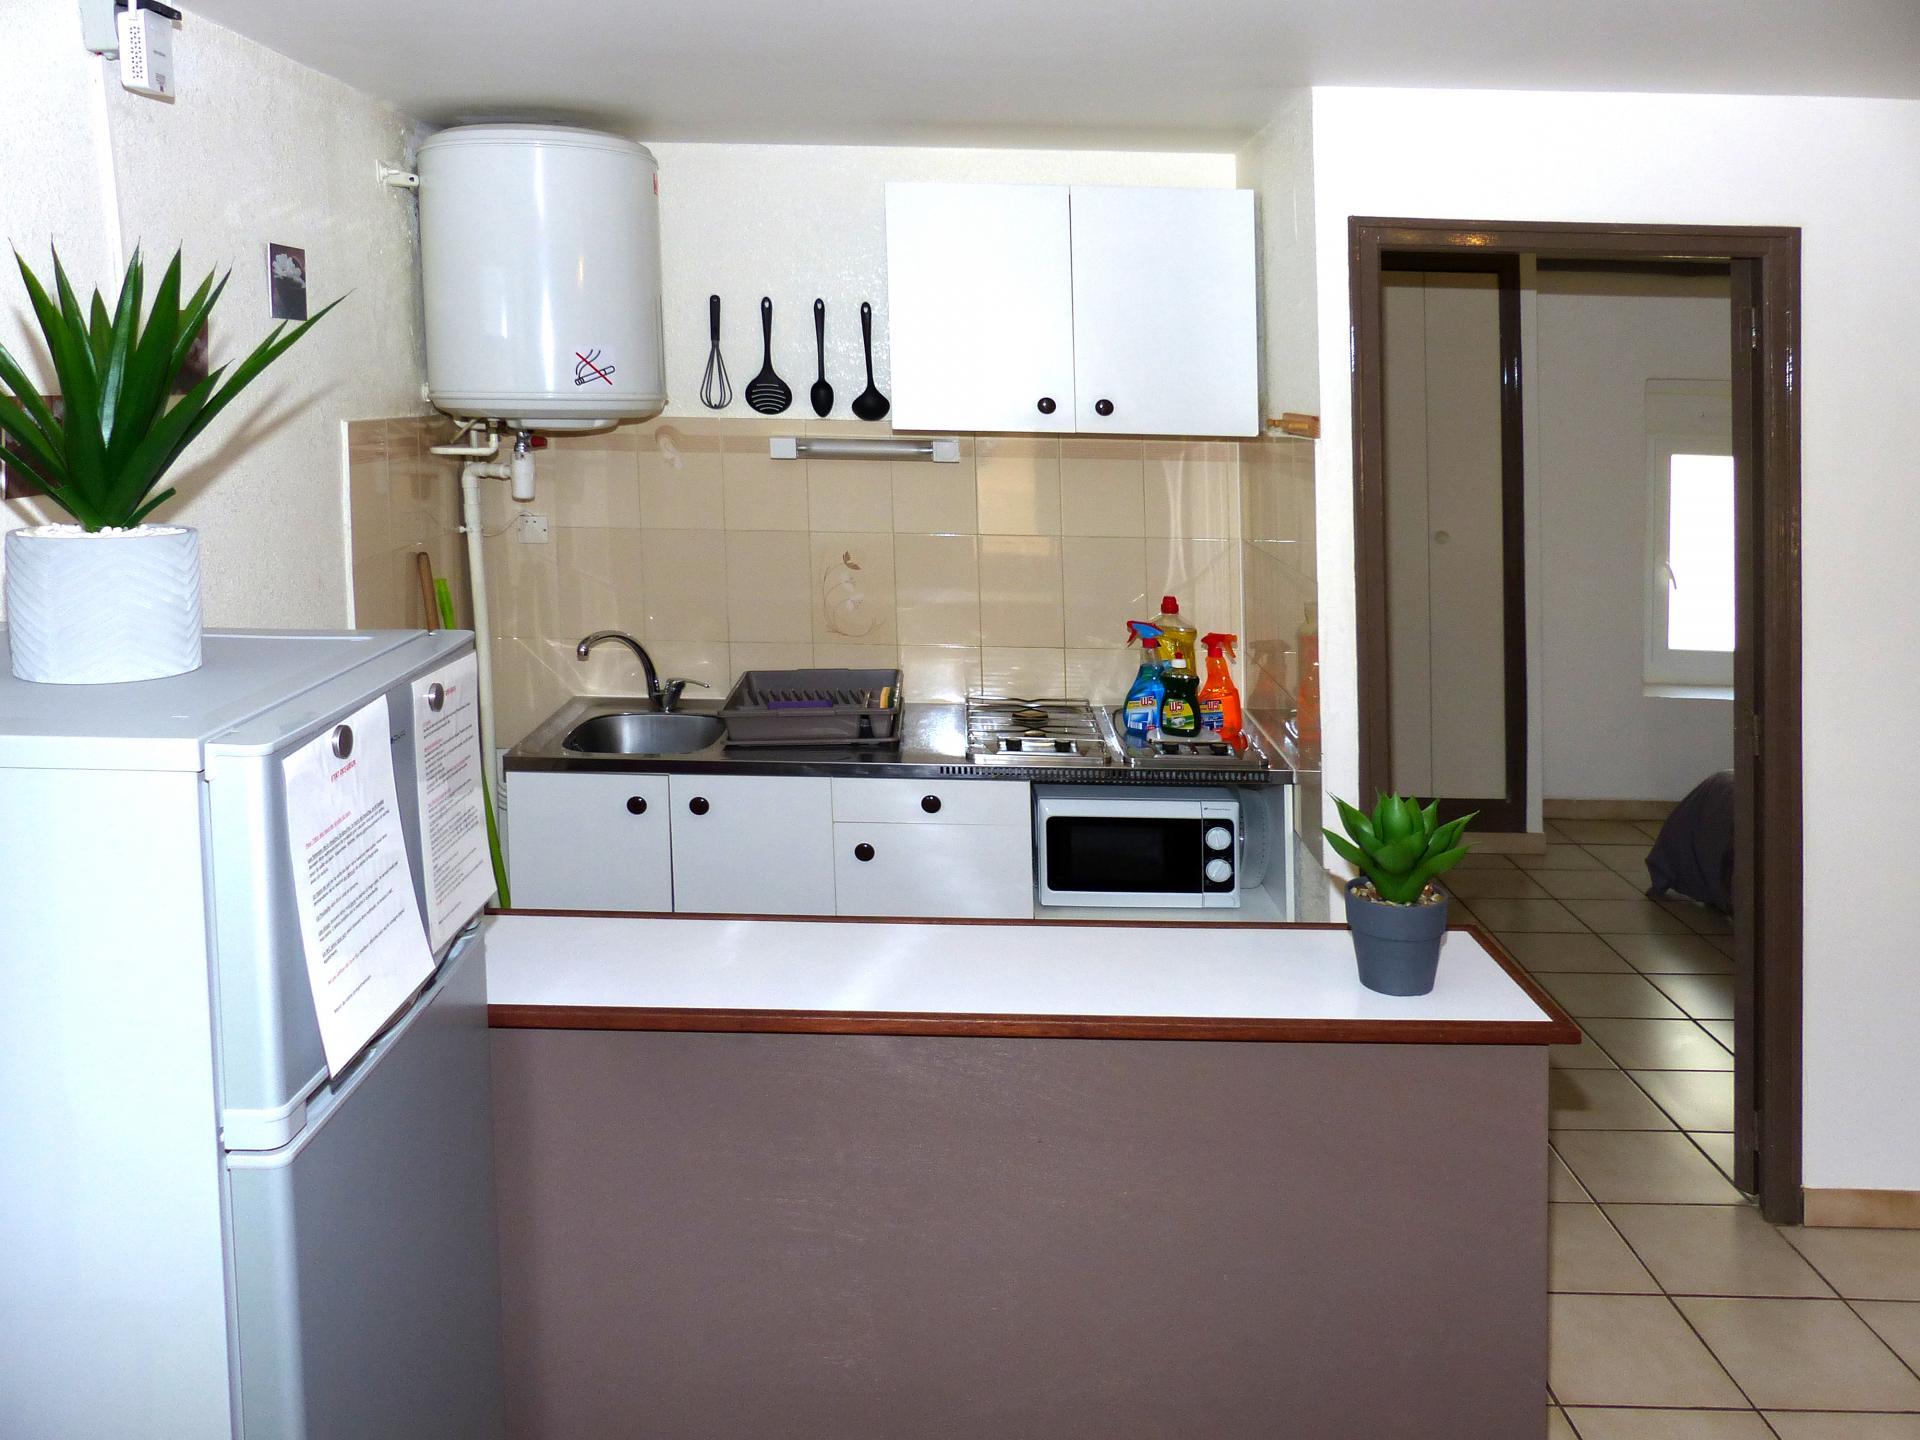 Appartement 1 chambre - Coin cuisine